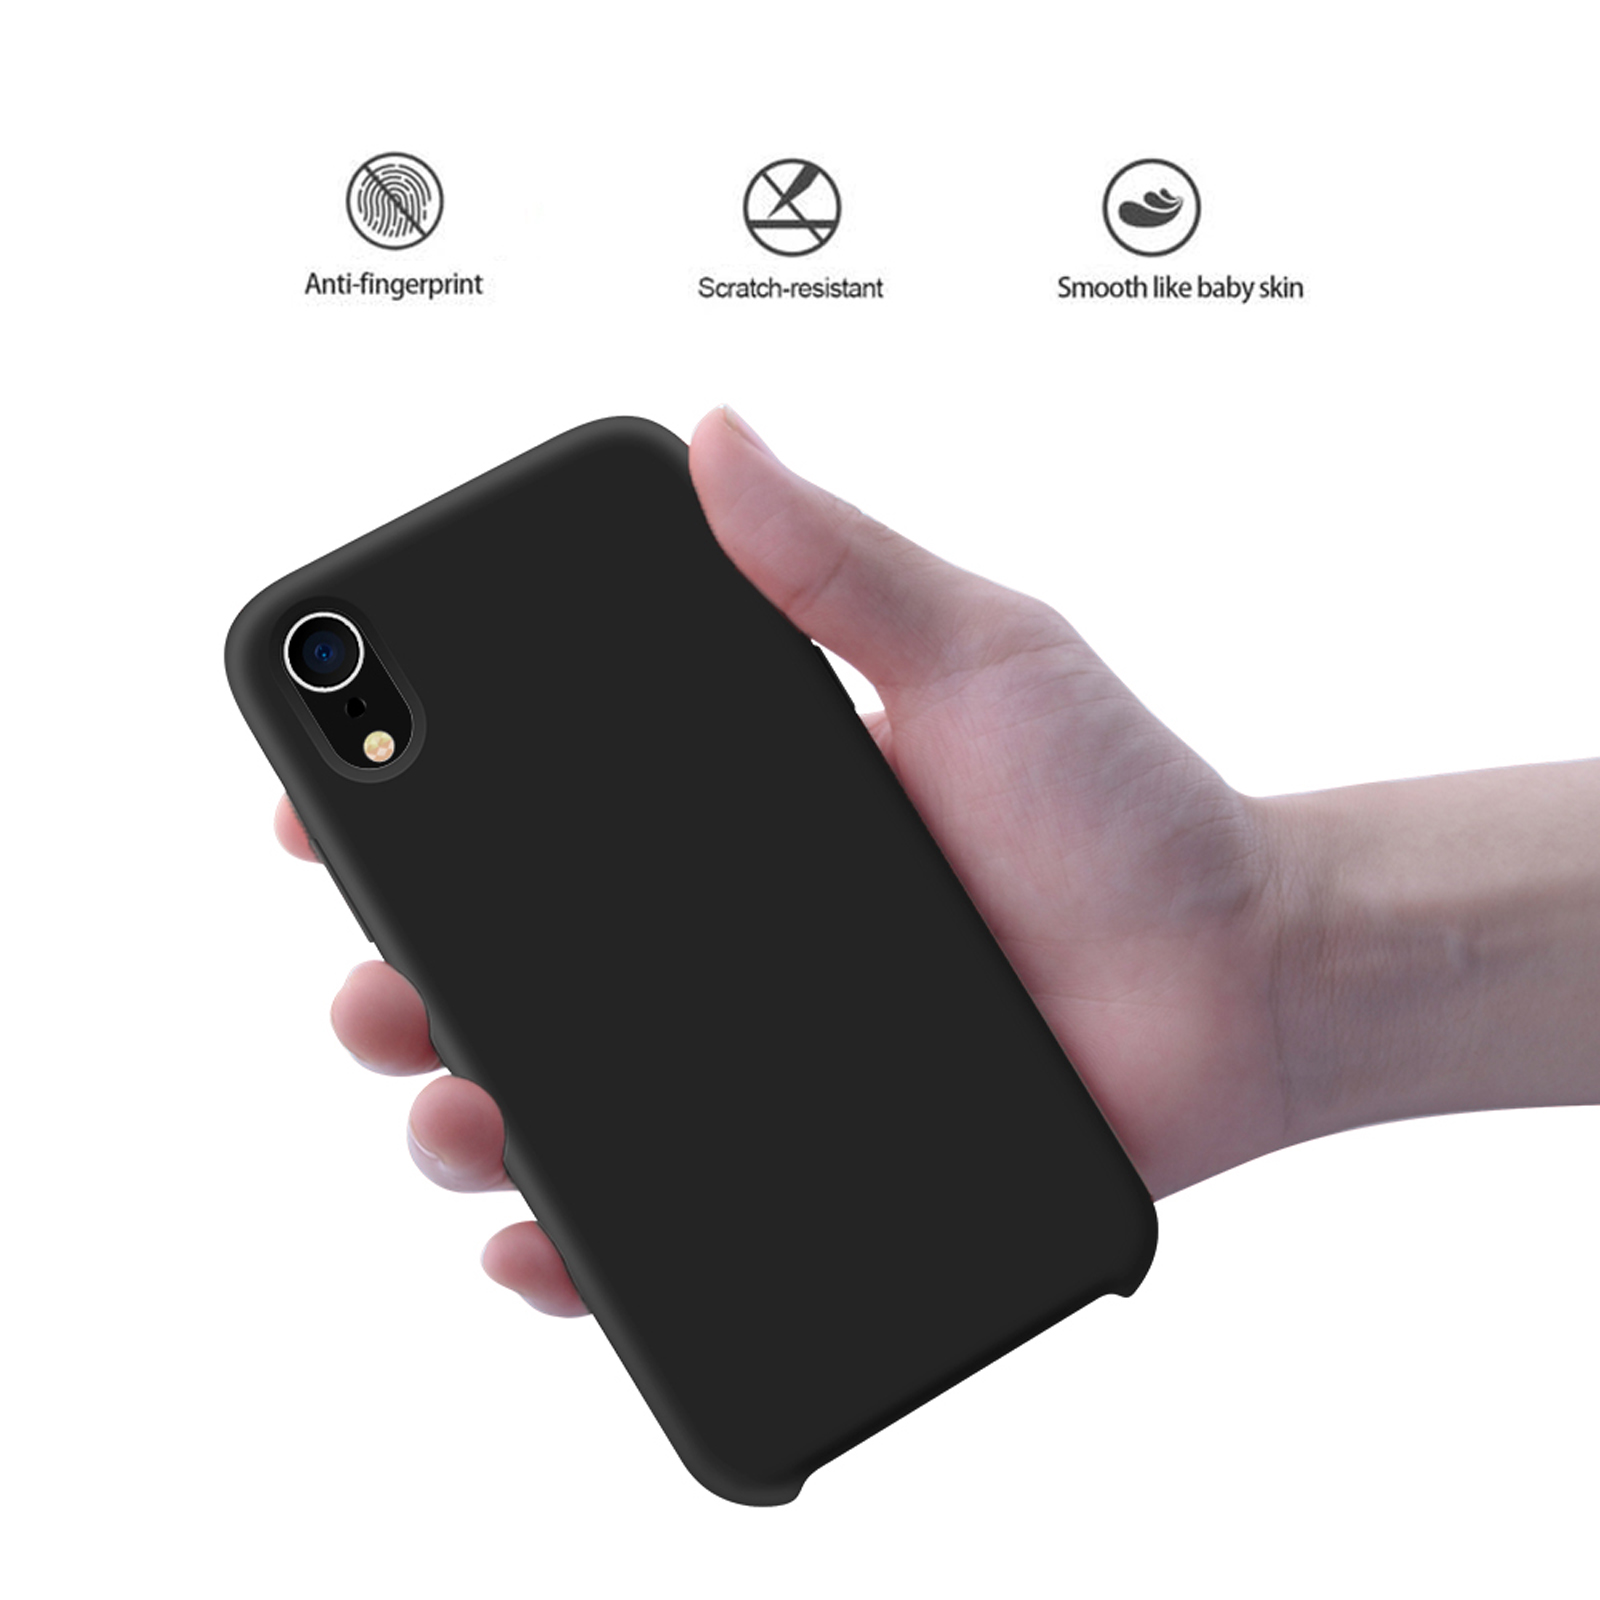 miniatuur 15 - For Apple iPhone 12 Pro Max Mini 11 XR X 8 7 Plus Se 2020 Case Cover Thin Slim